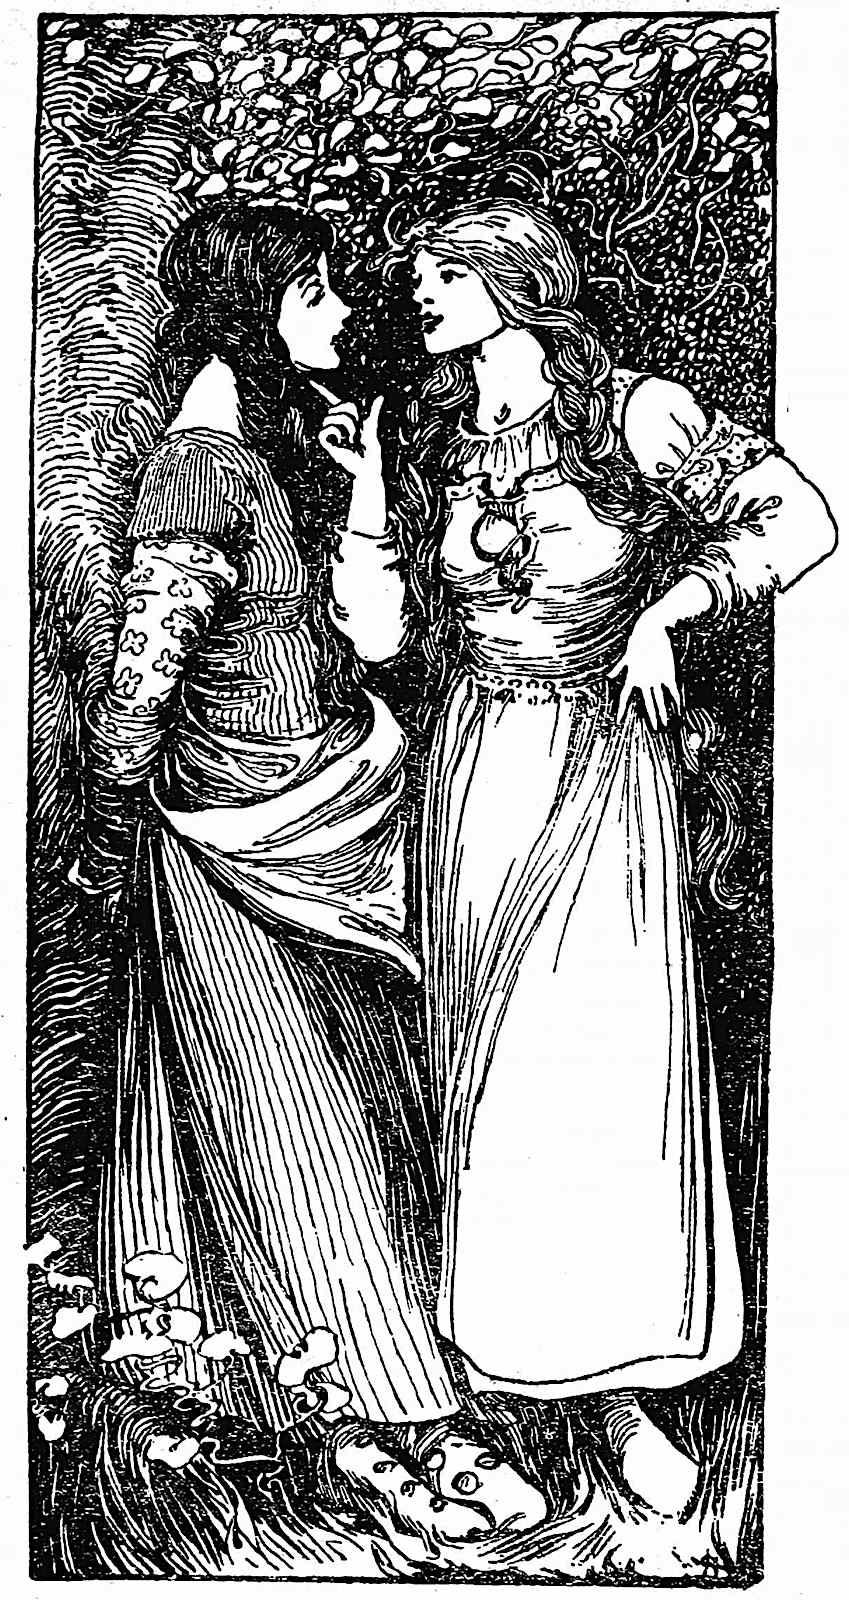 an Ellen Stratton illustration of two women talking in nature